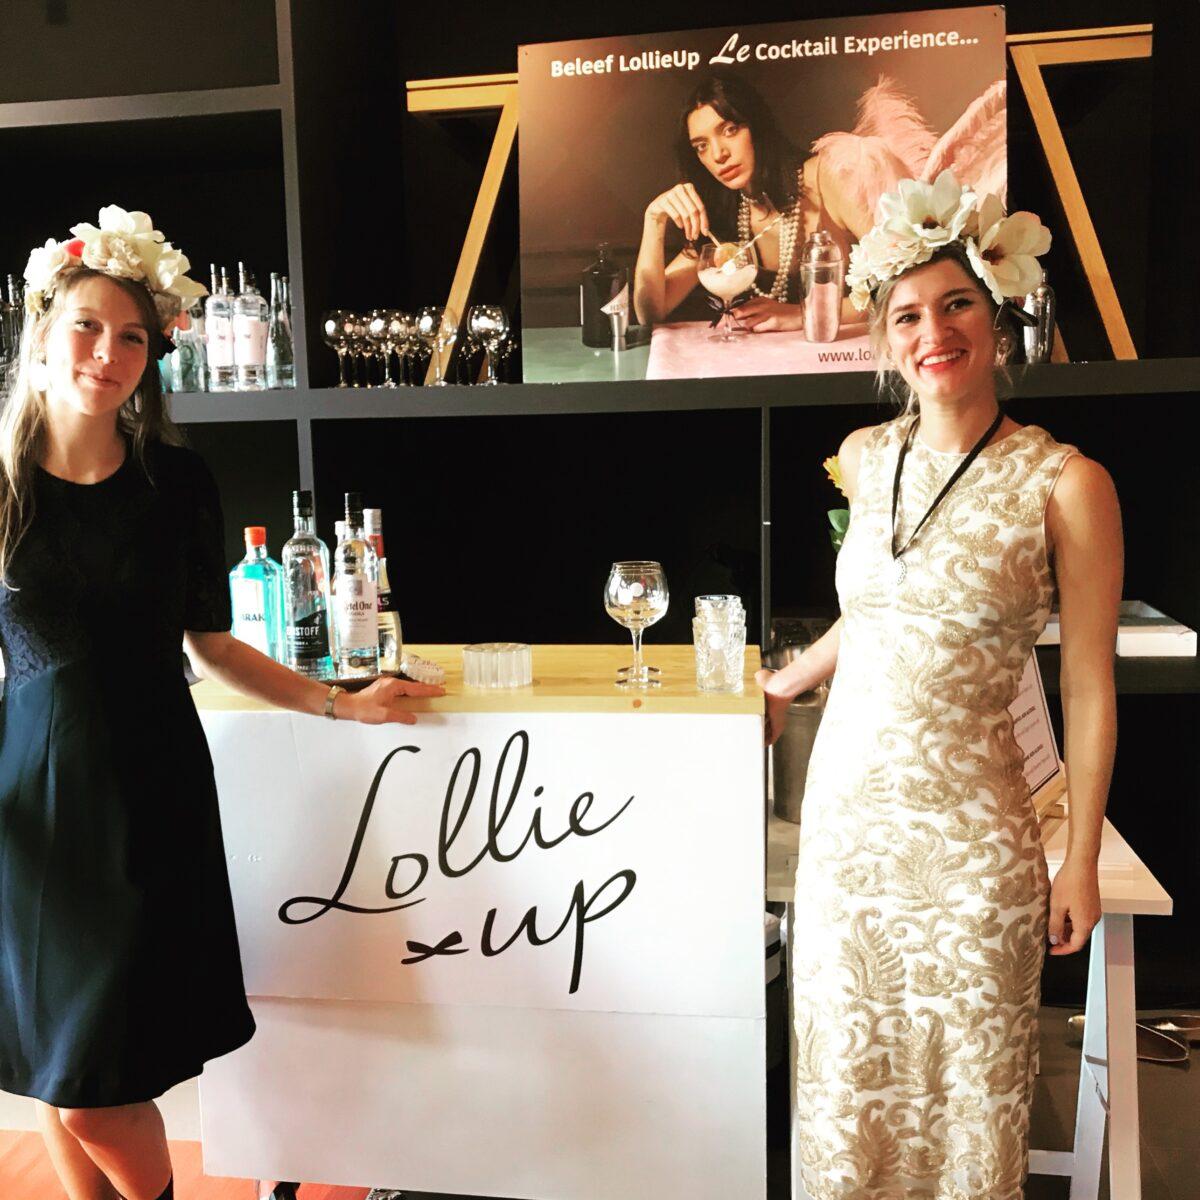 Lollieup_Bar - gespot, culitainment, lolly, cocktail, mix, samen